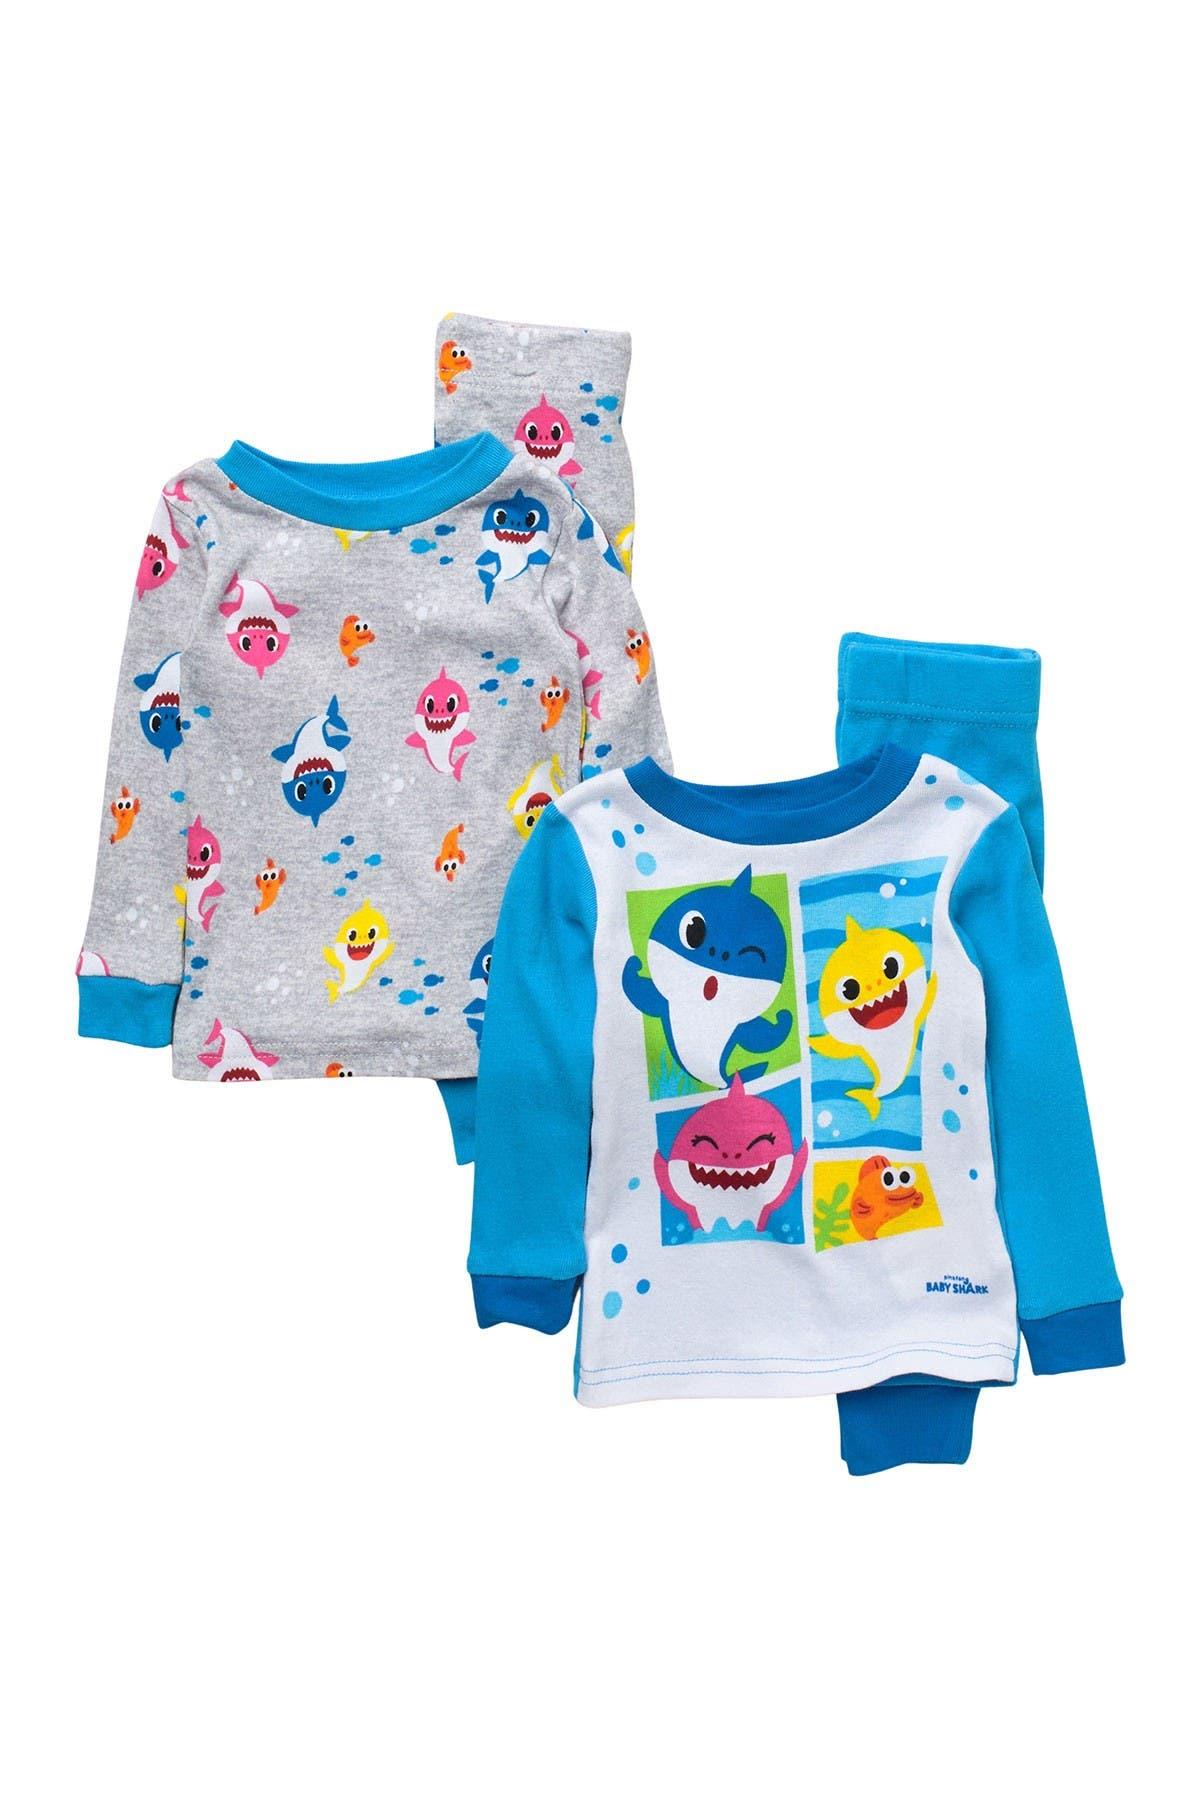 Image of AME Baby Shark Cotton Pajama Set - Set of 2